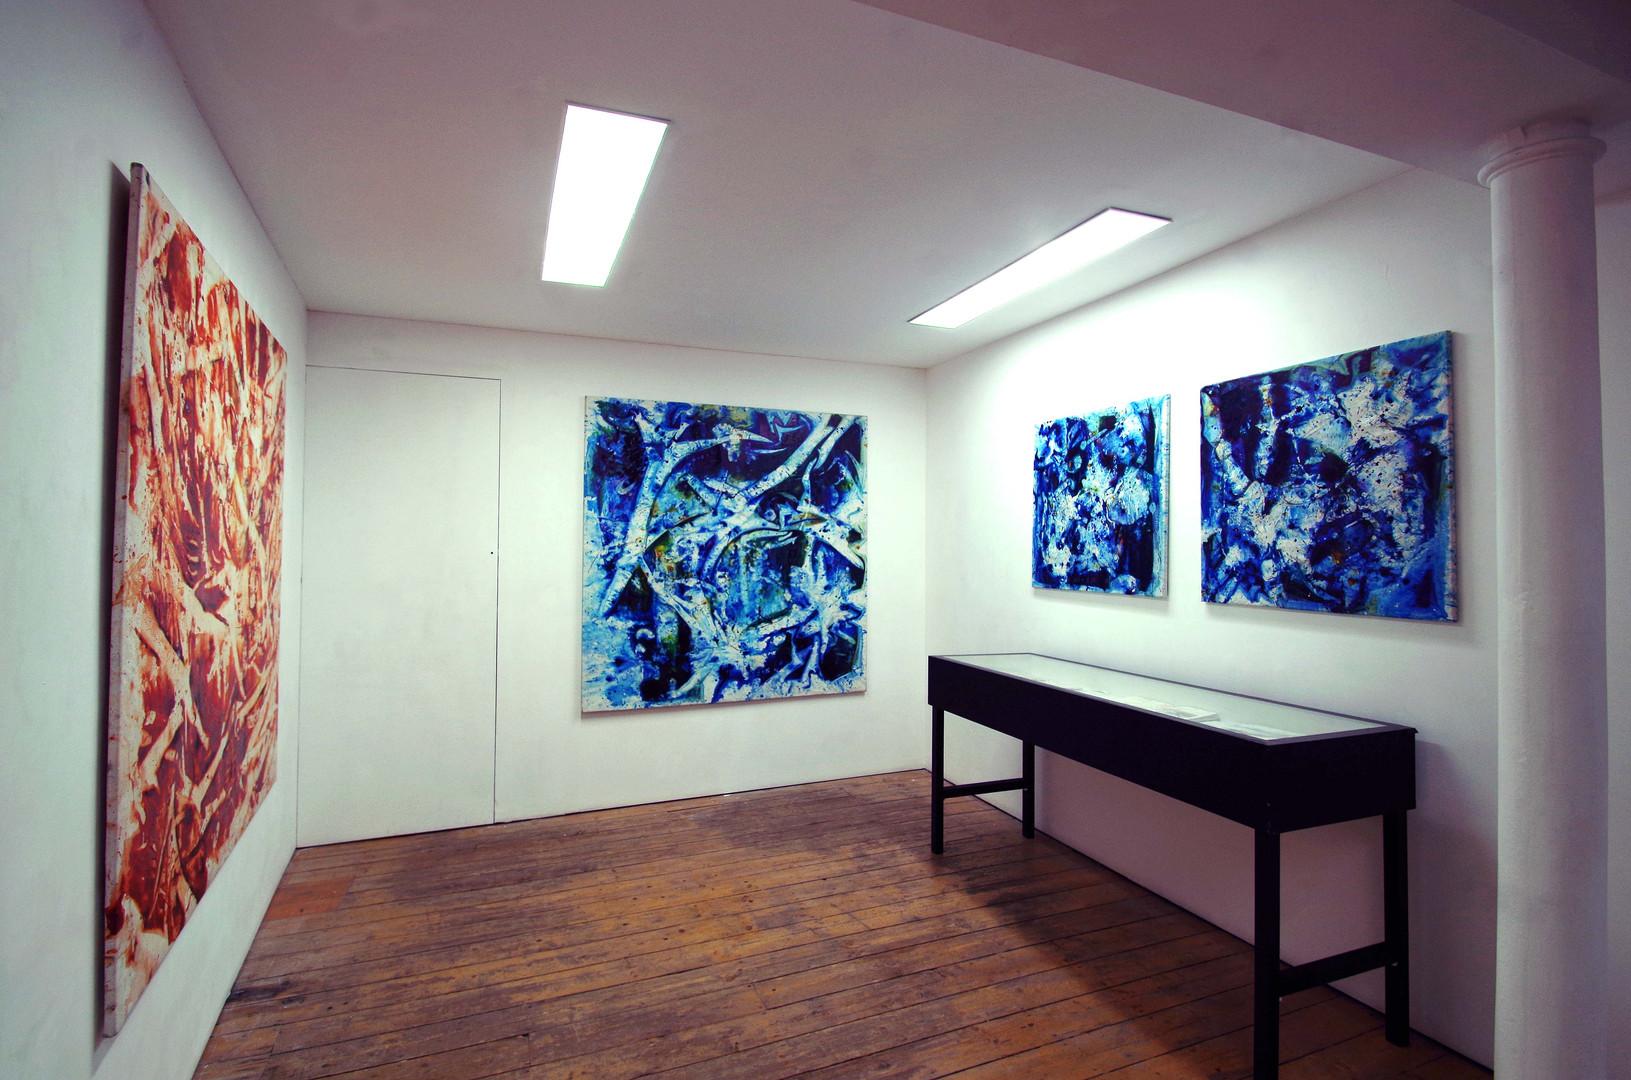 Gallery II - View III